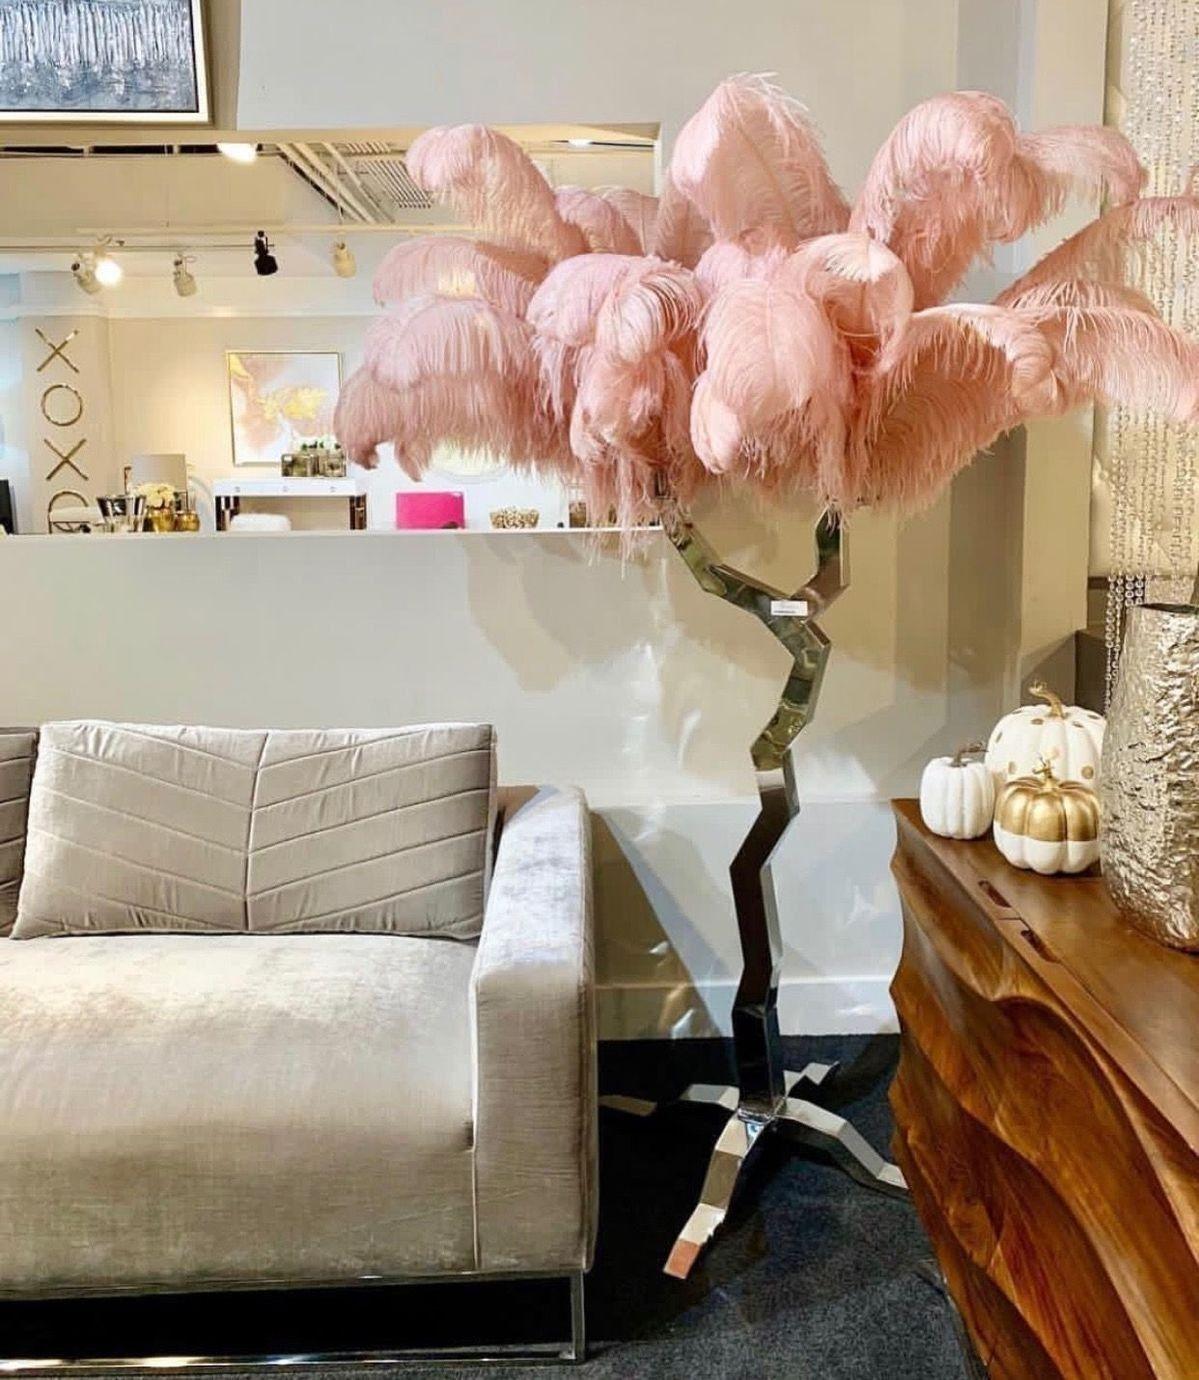 𝓒𝓪𝓷𝓭𝔂 🎀 𝓛𝓲𝓬𝓲𝓸𝓾𝓼 in 2019 Bedroom decor, Home, Living room